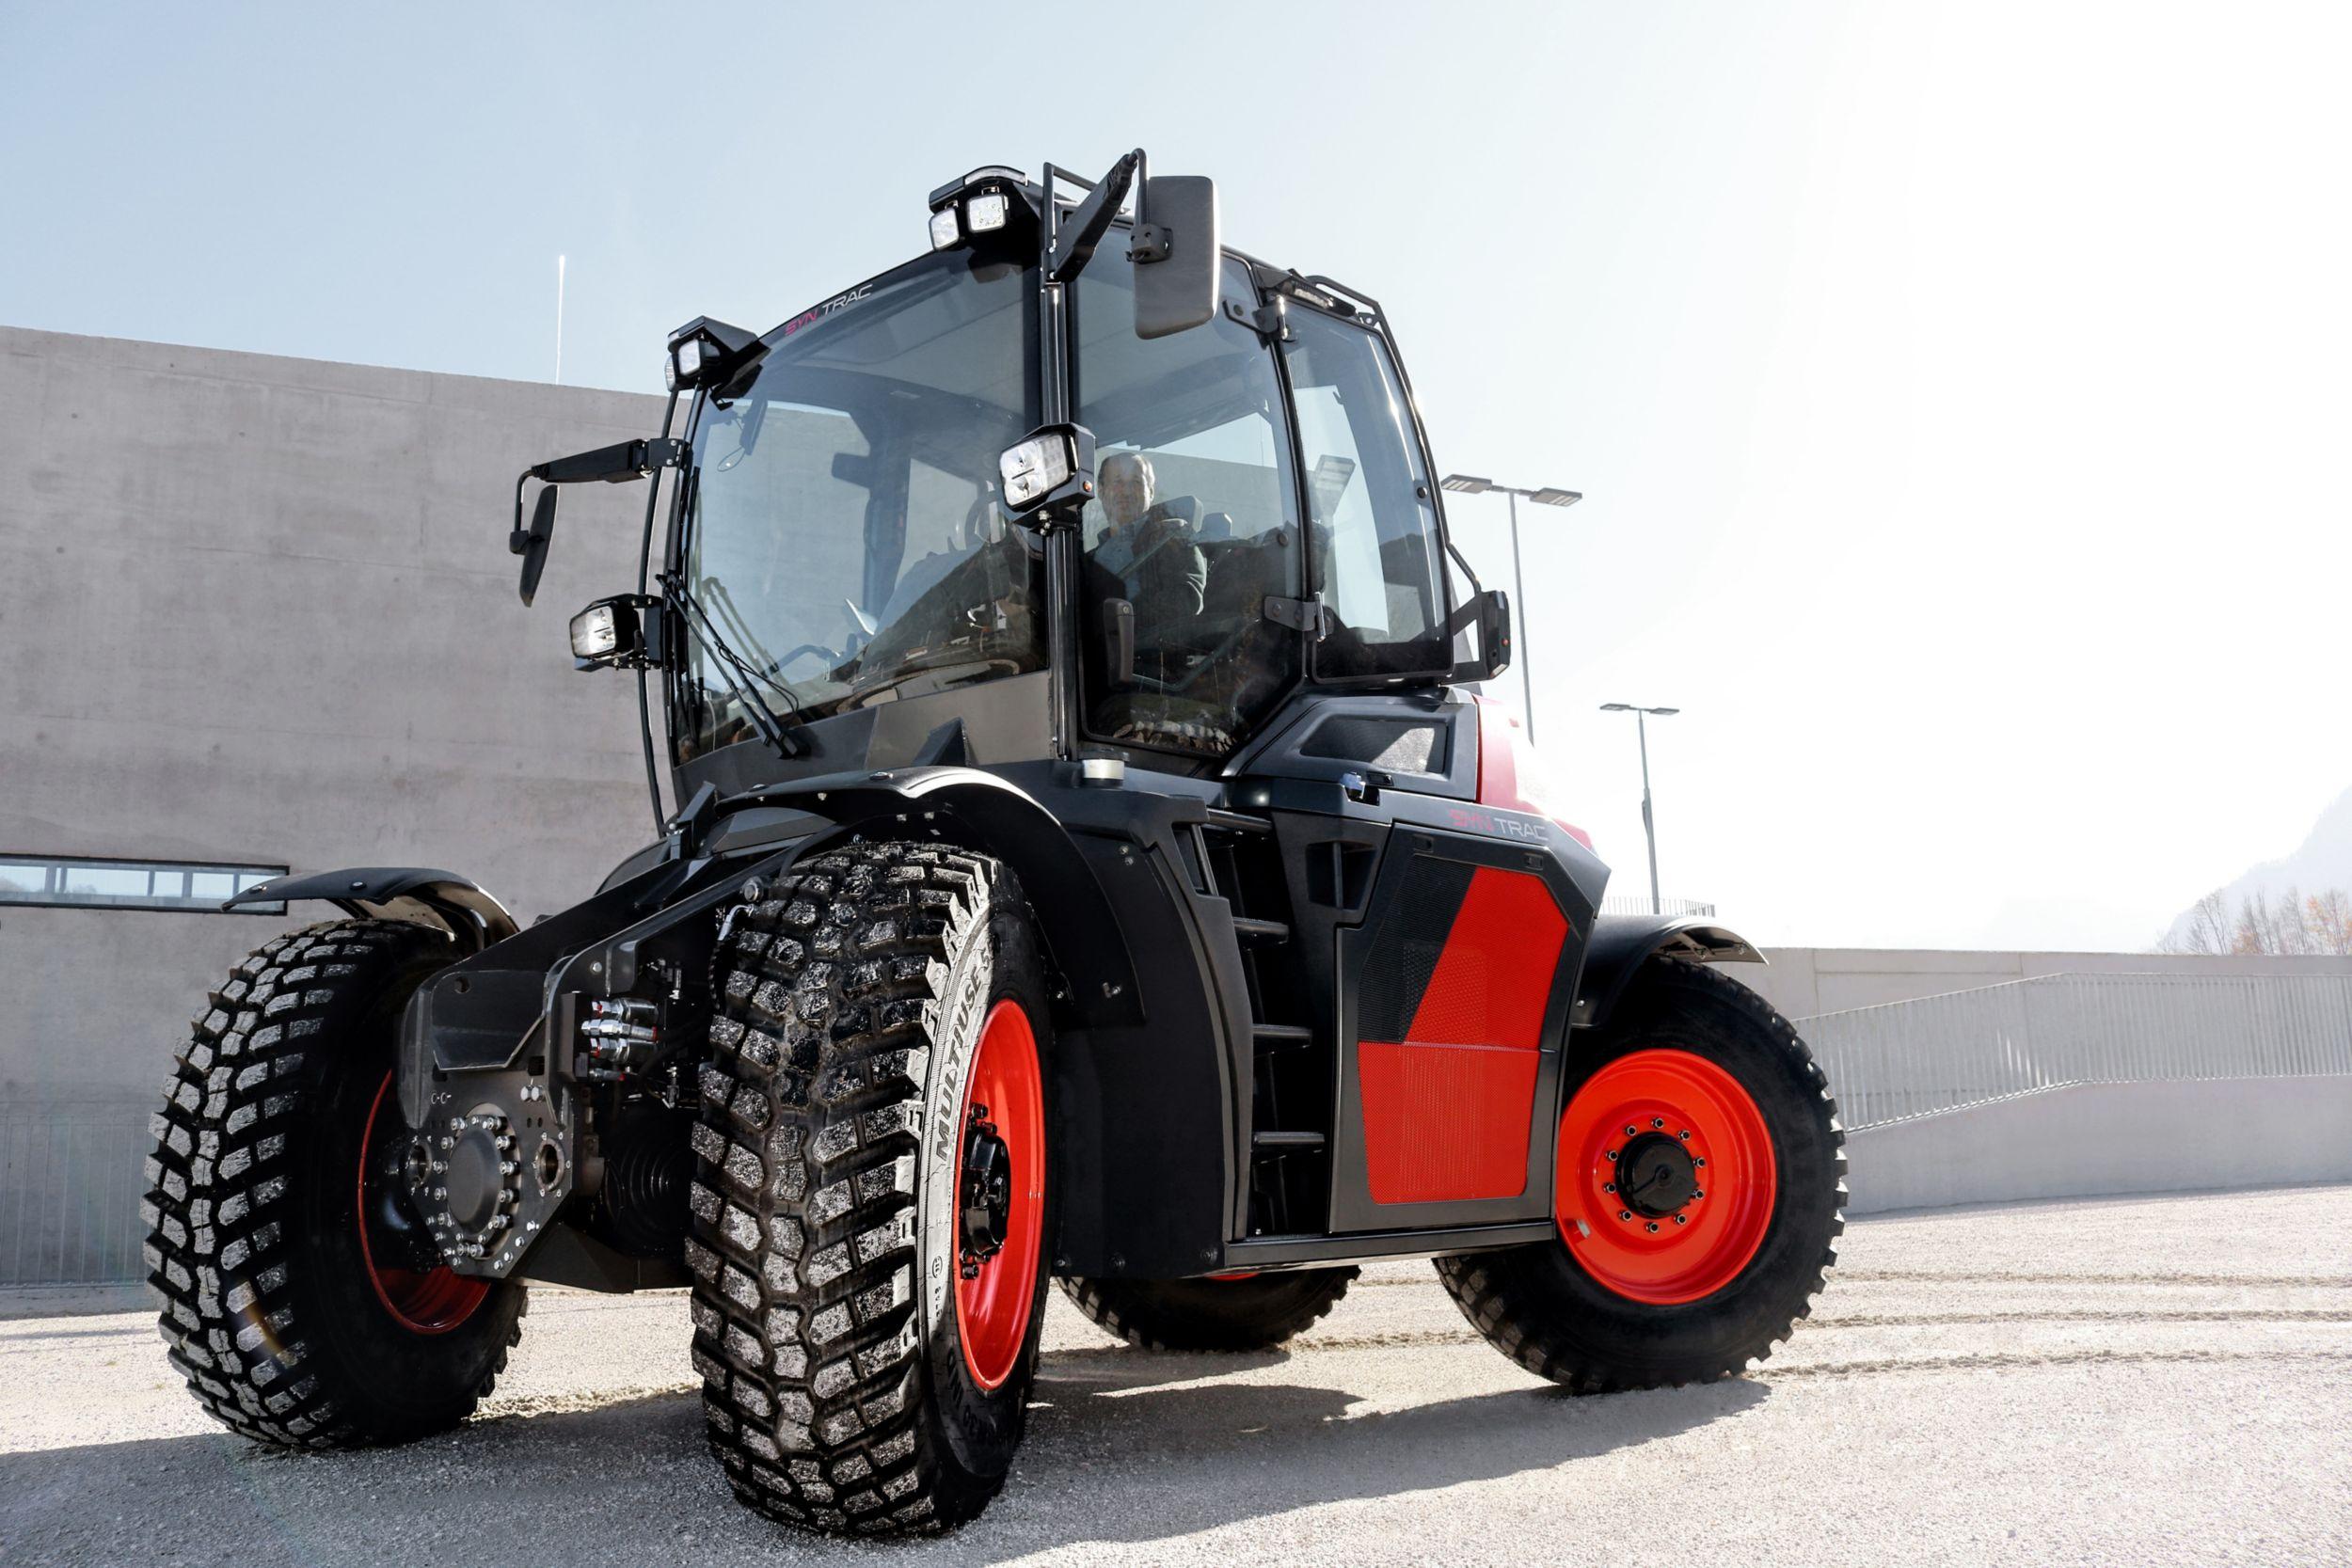 C9.3B Tier 4 Diesel Engines - Highly Regulated>